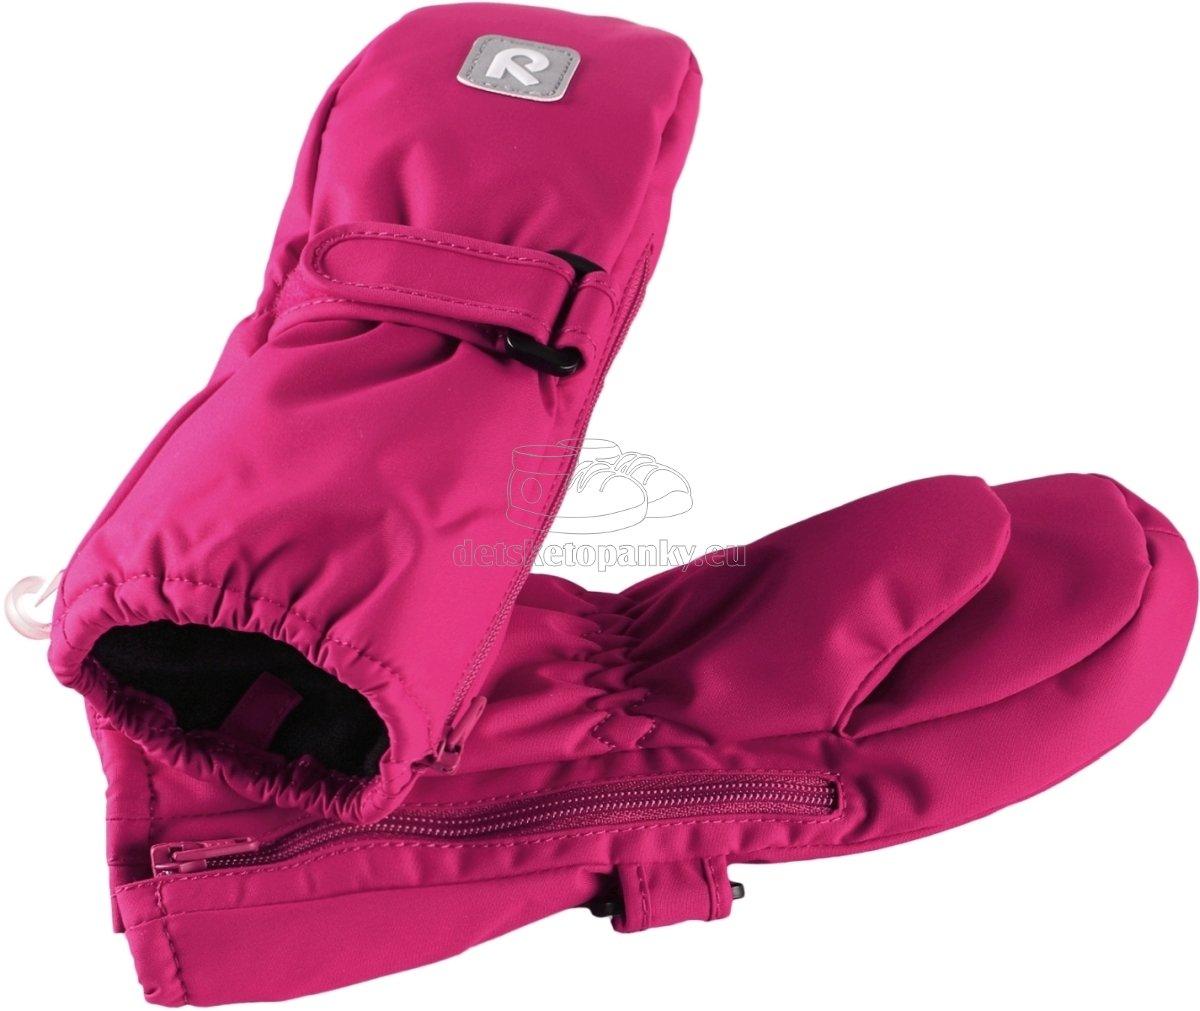 Detské rukavice Reima 517161 Tassu cranberry pink